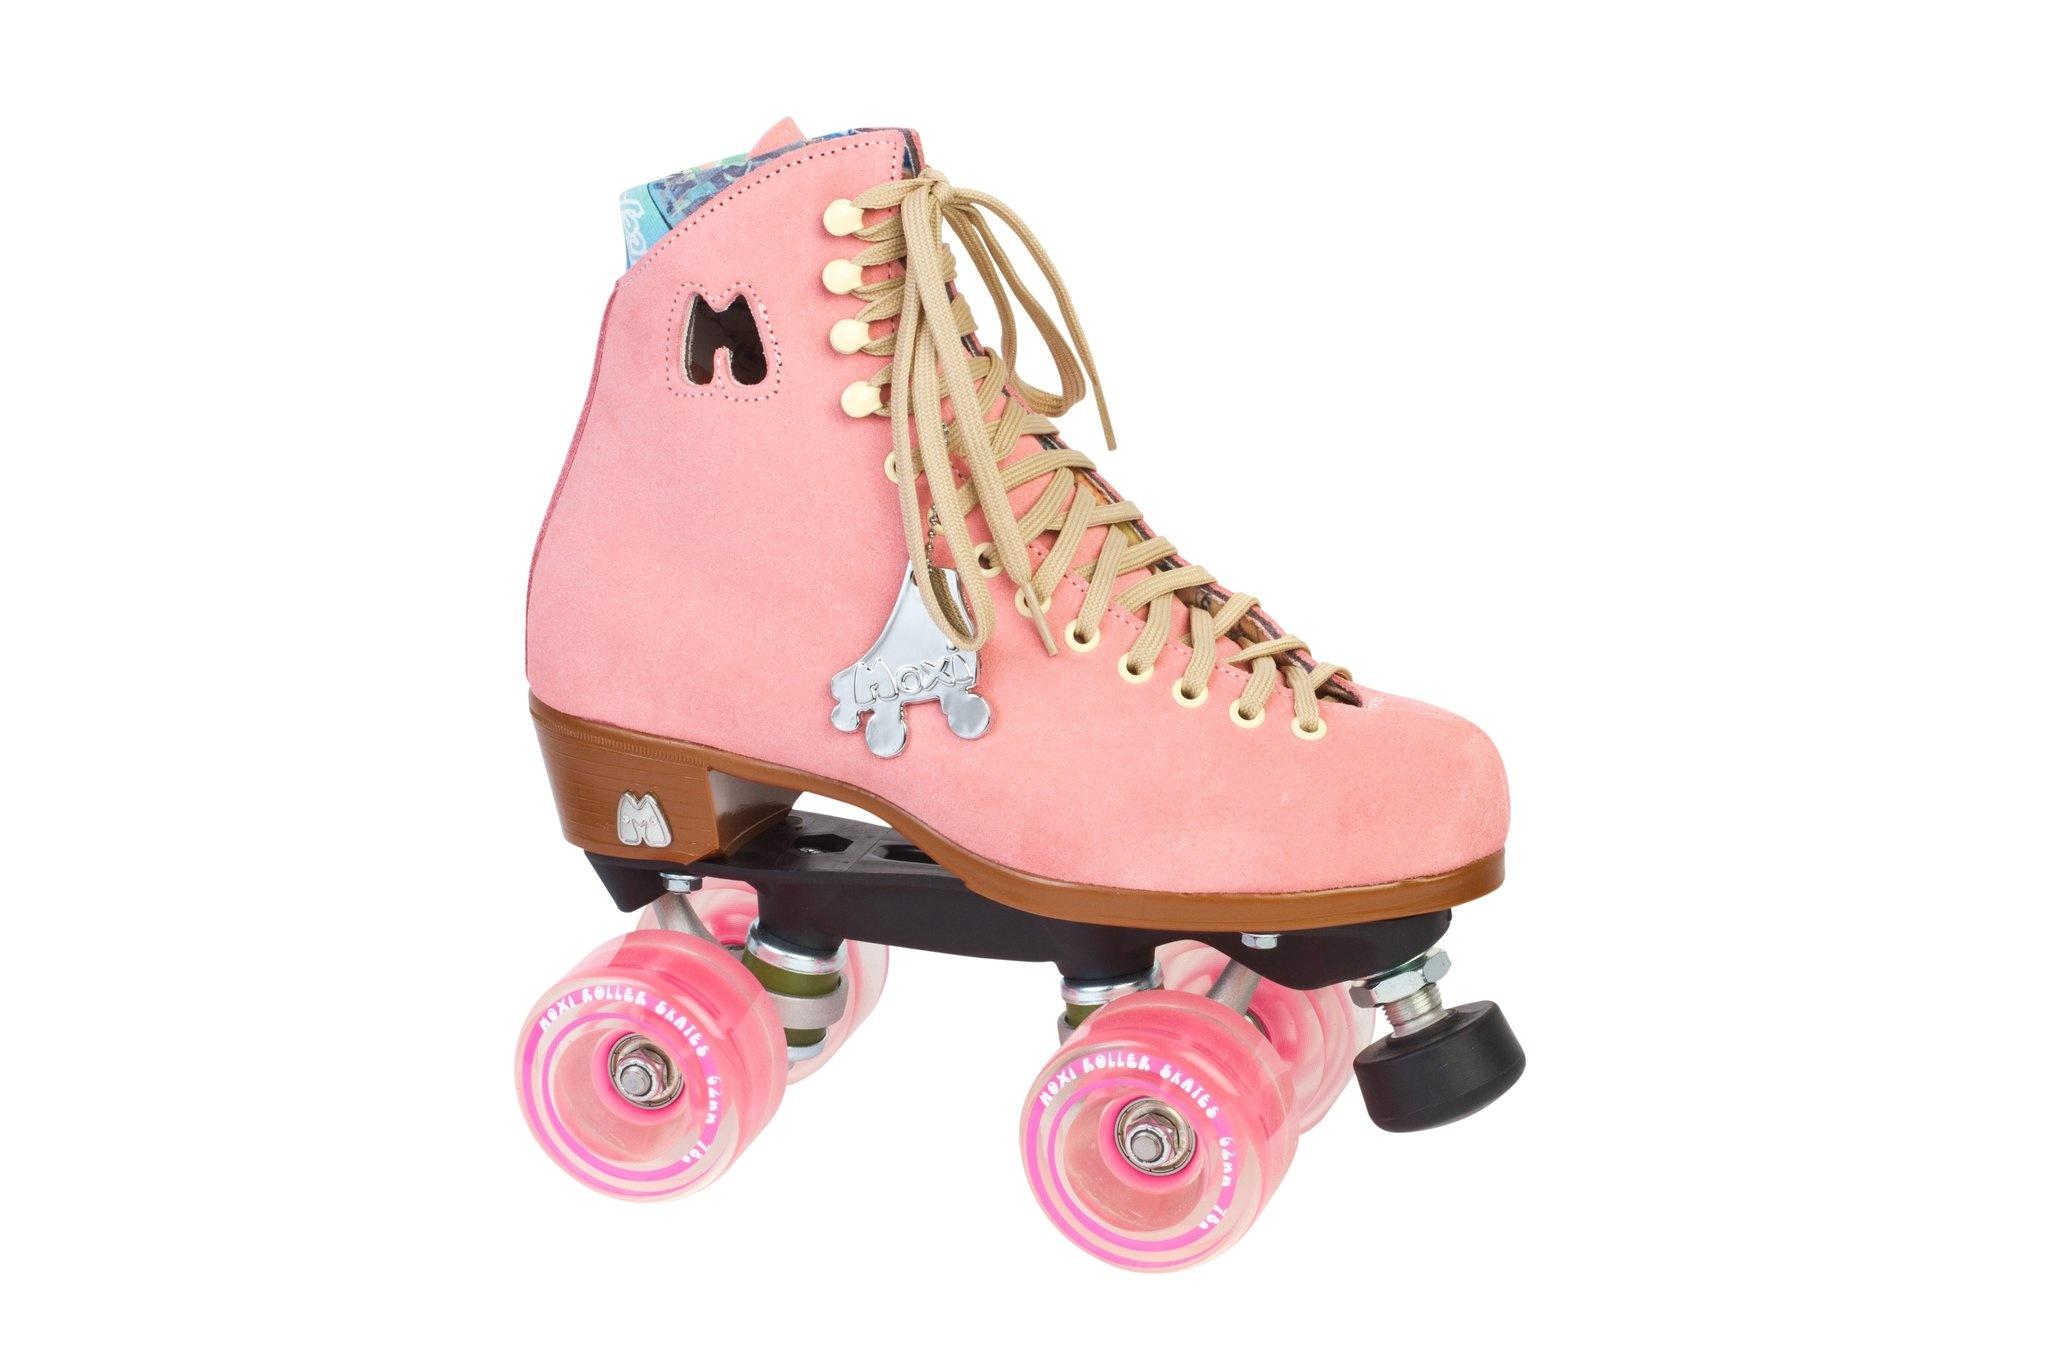 Moxi Lolly Skate Strawberry Pink